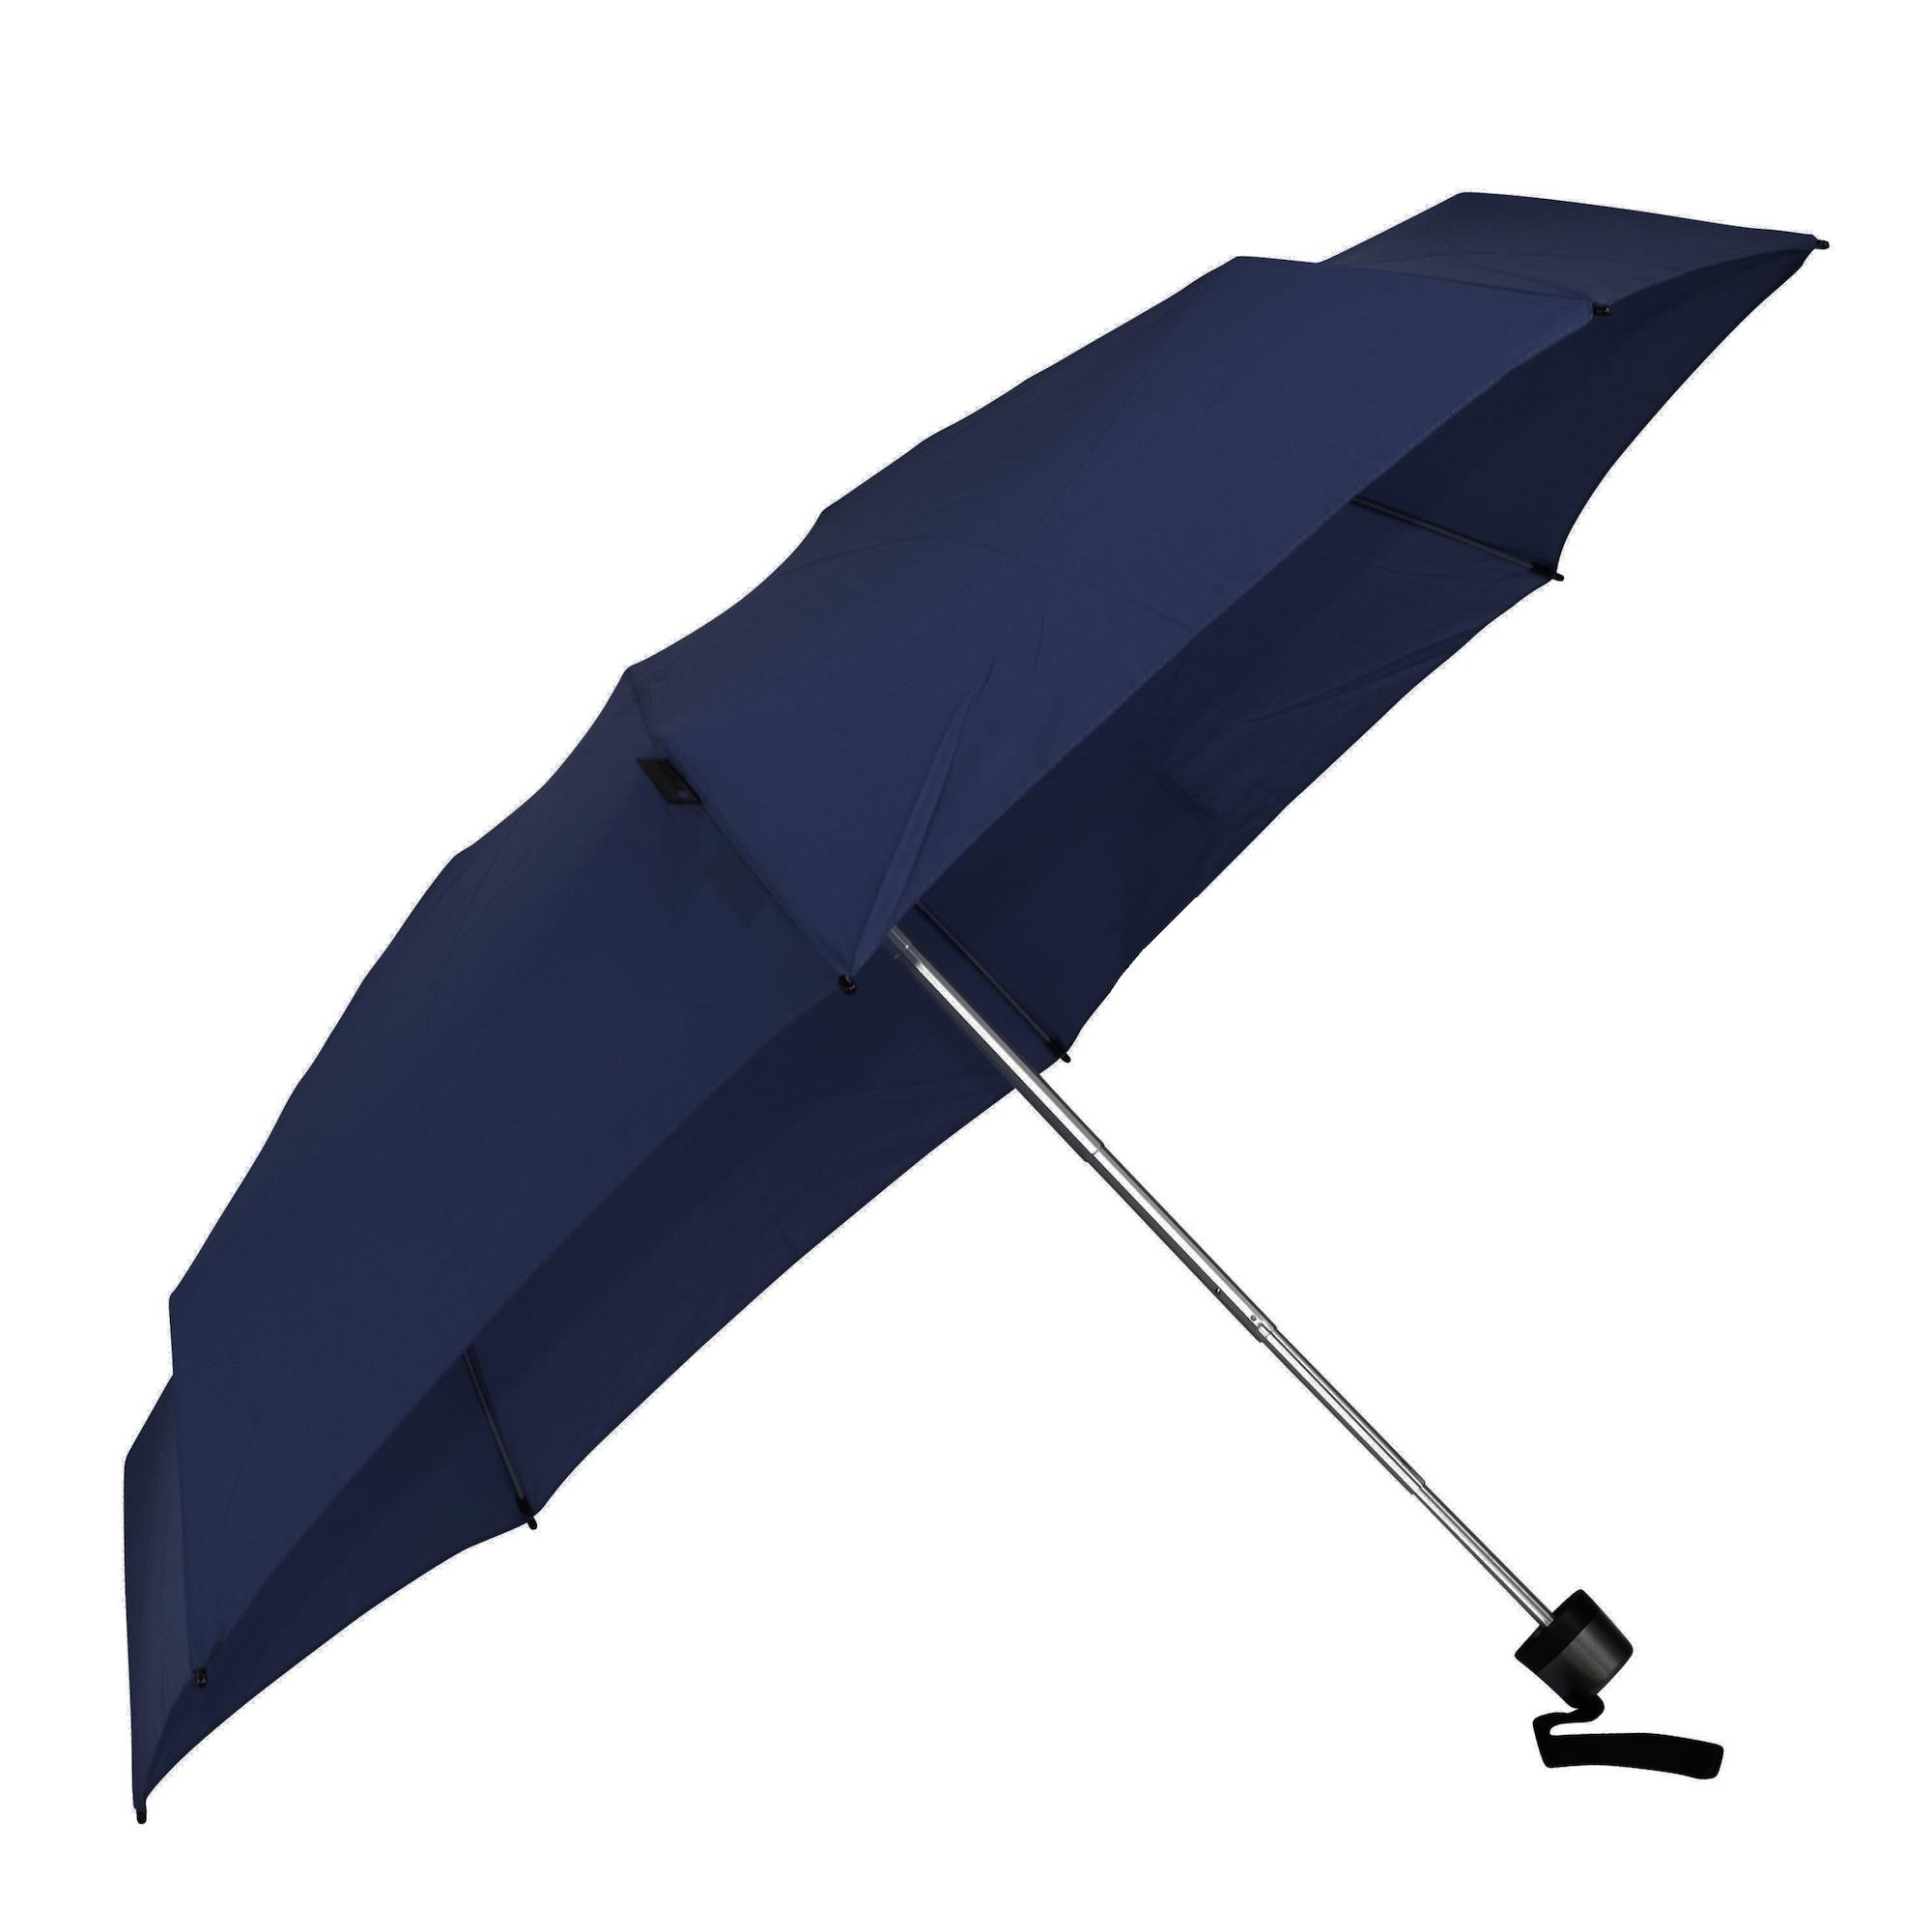 Taschenschirm | Accessoires > Regenschirme | knirps